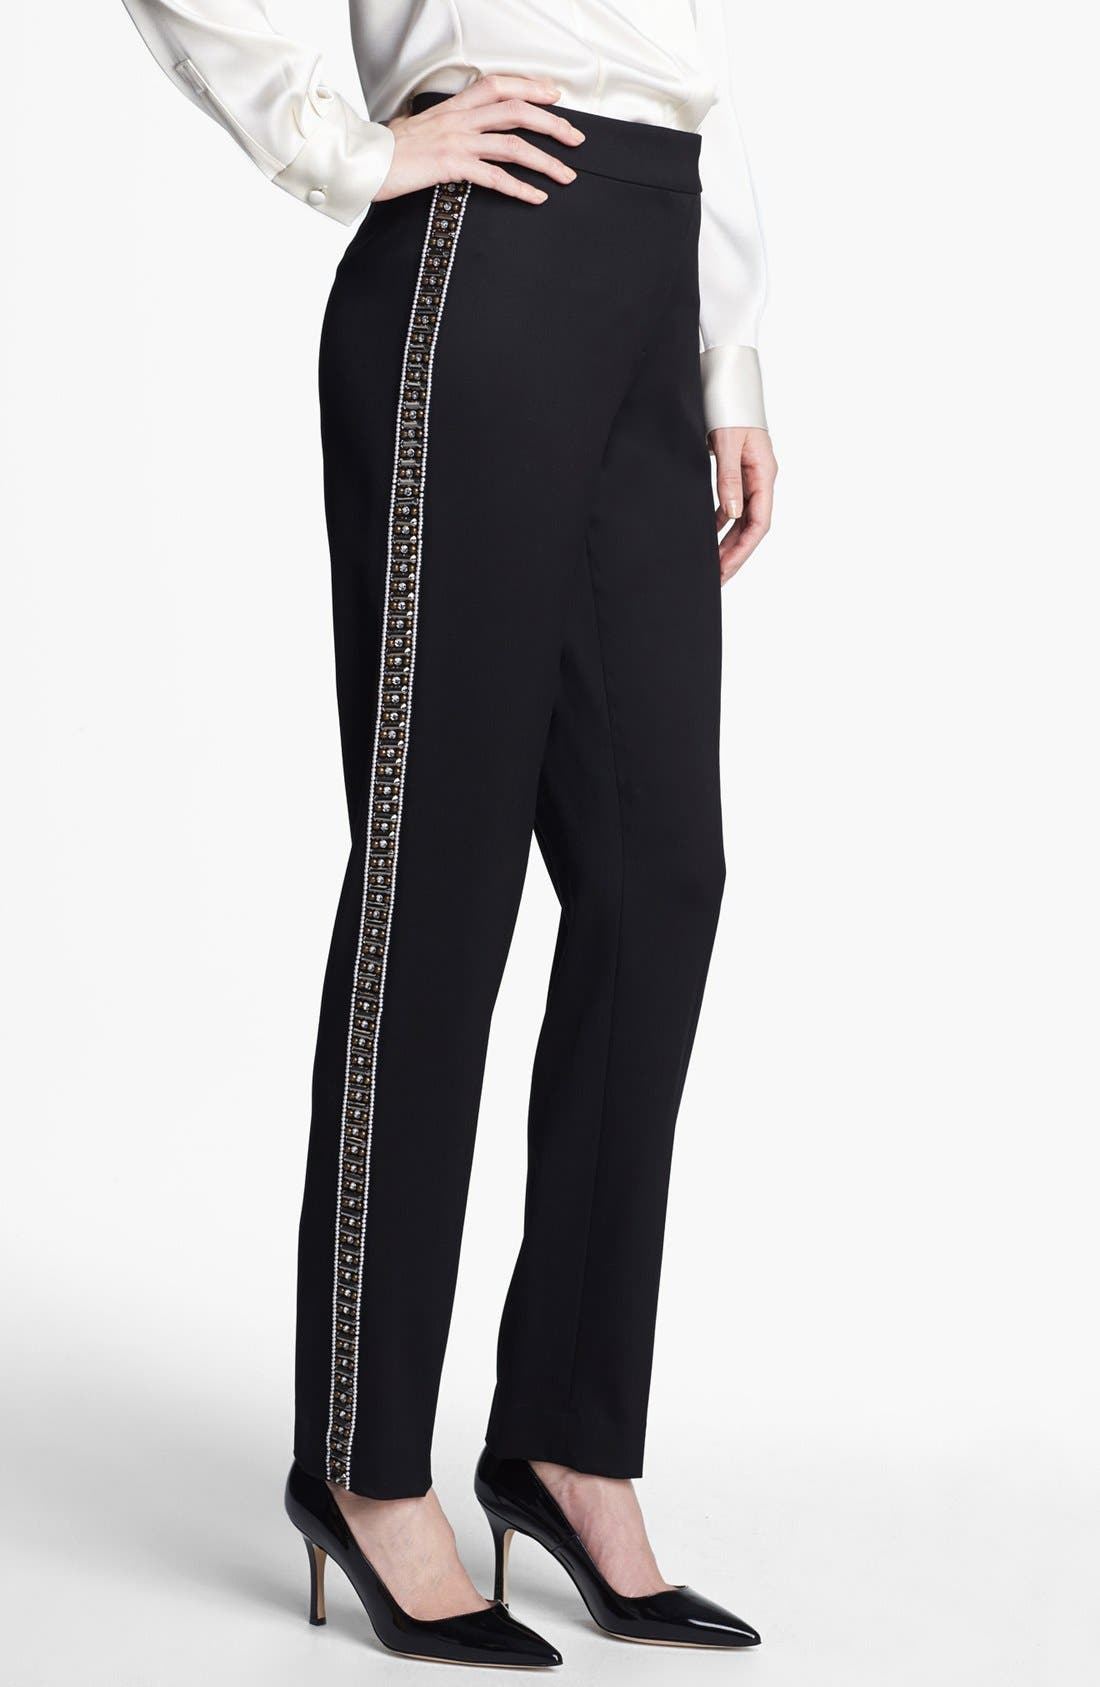 Alternate Image 1 Selected - St. John Collection 'Emma' Embellished Venetian Wool Pants